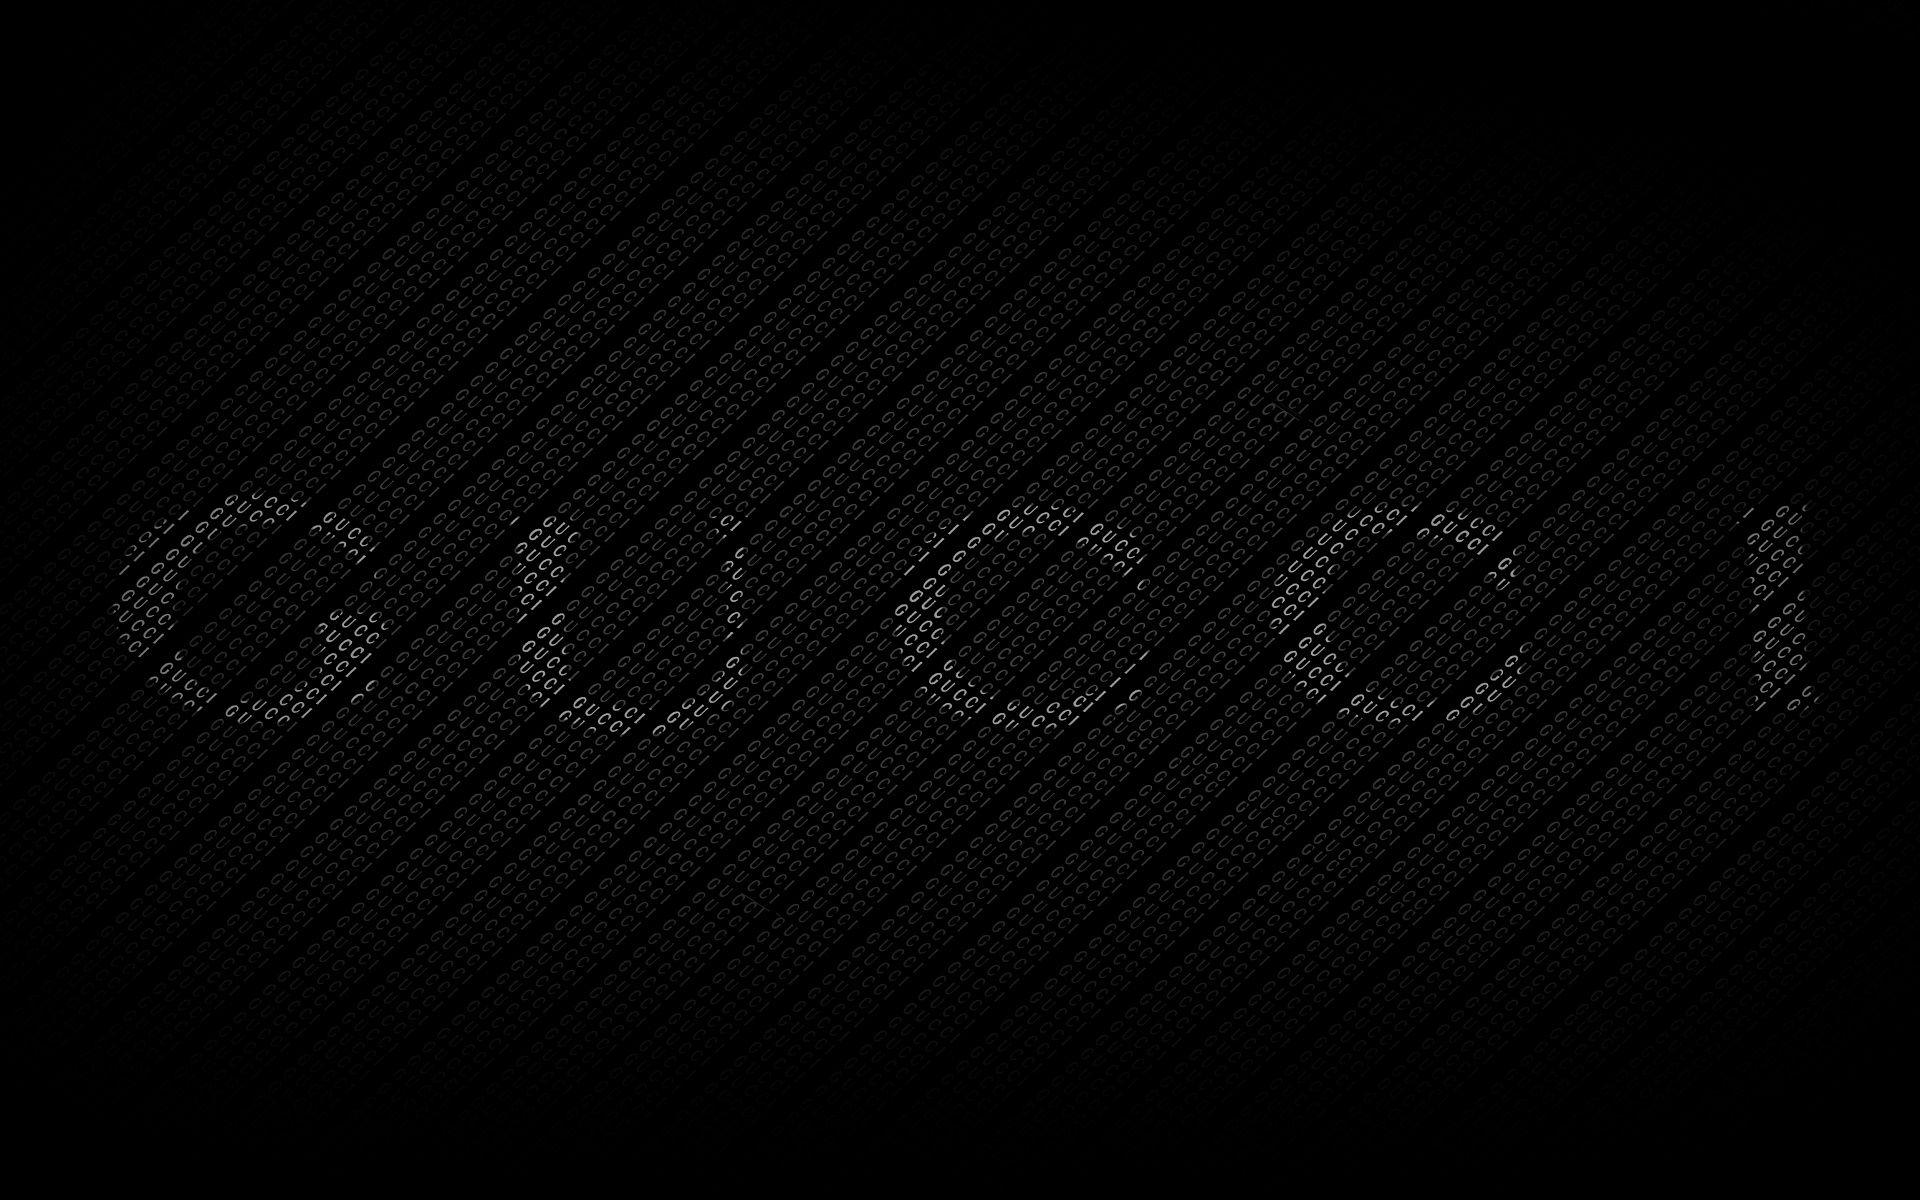 Gucci Wallpapers Hd Logo Wallpaper Hd Laptop Wallpaper Desktop Wallpapers Dark Wallpaper